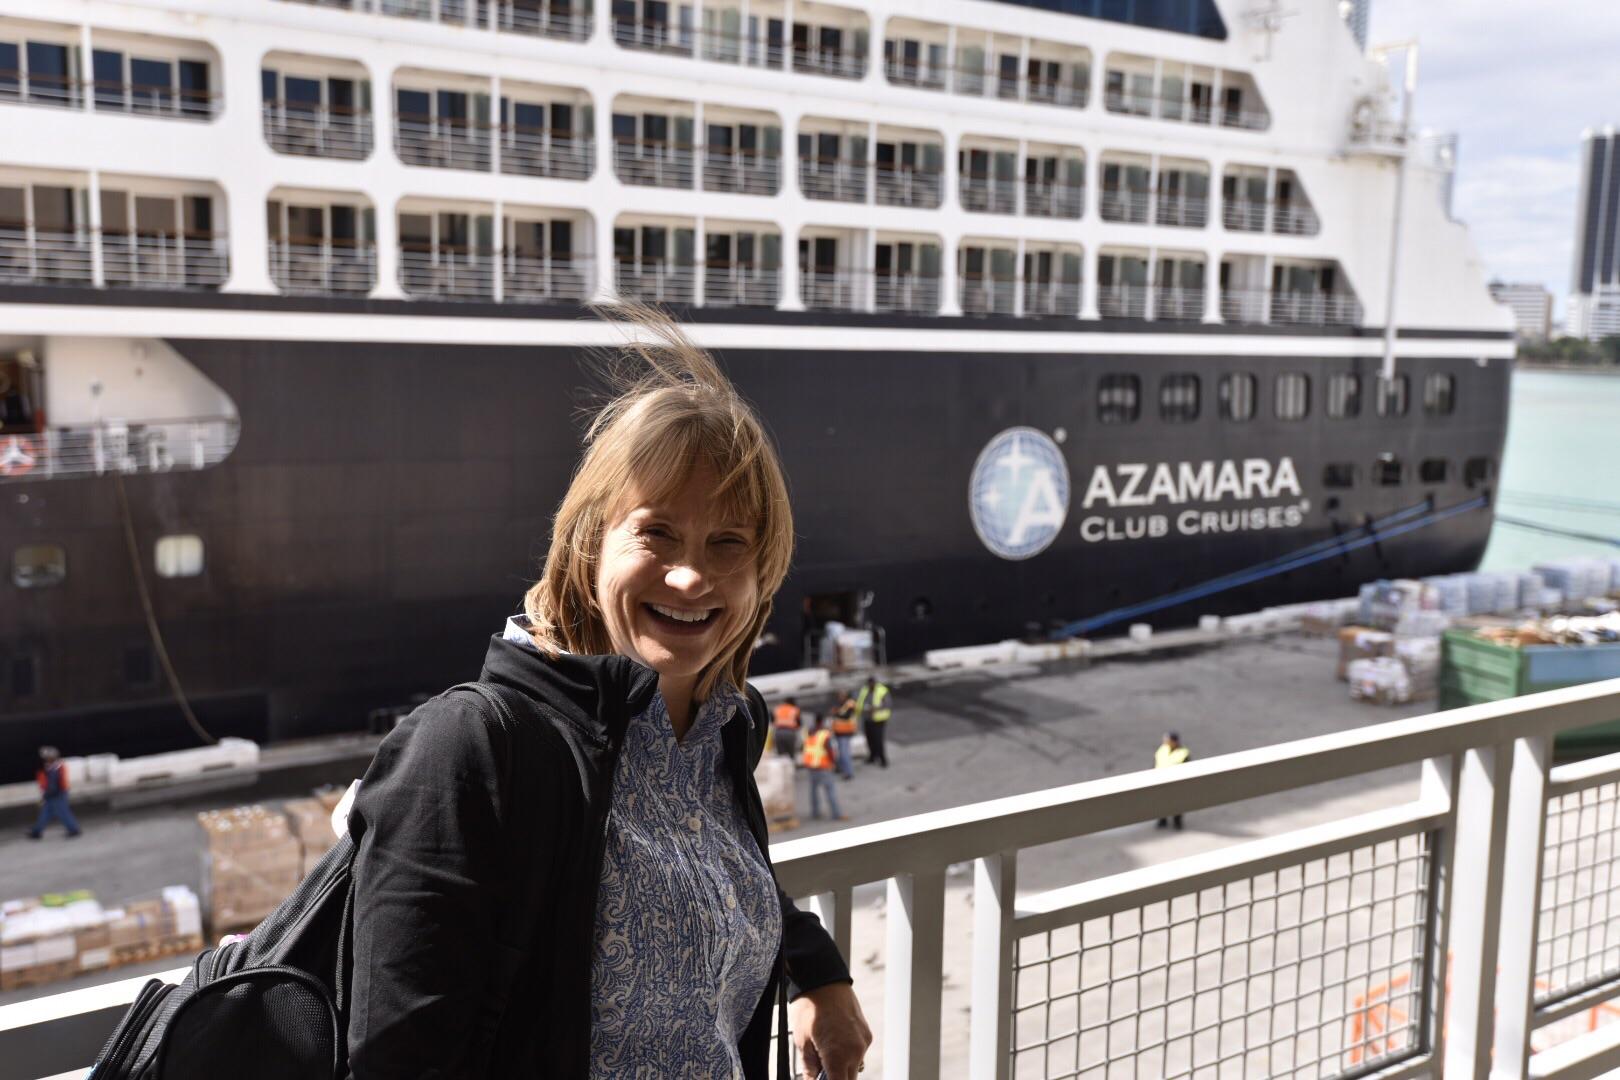 Boarding the Azamara Journey